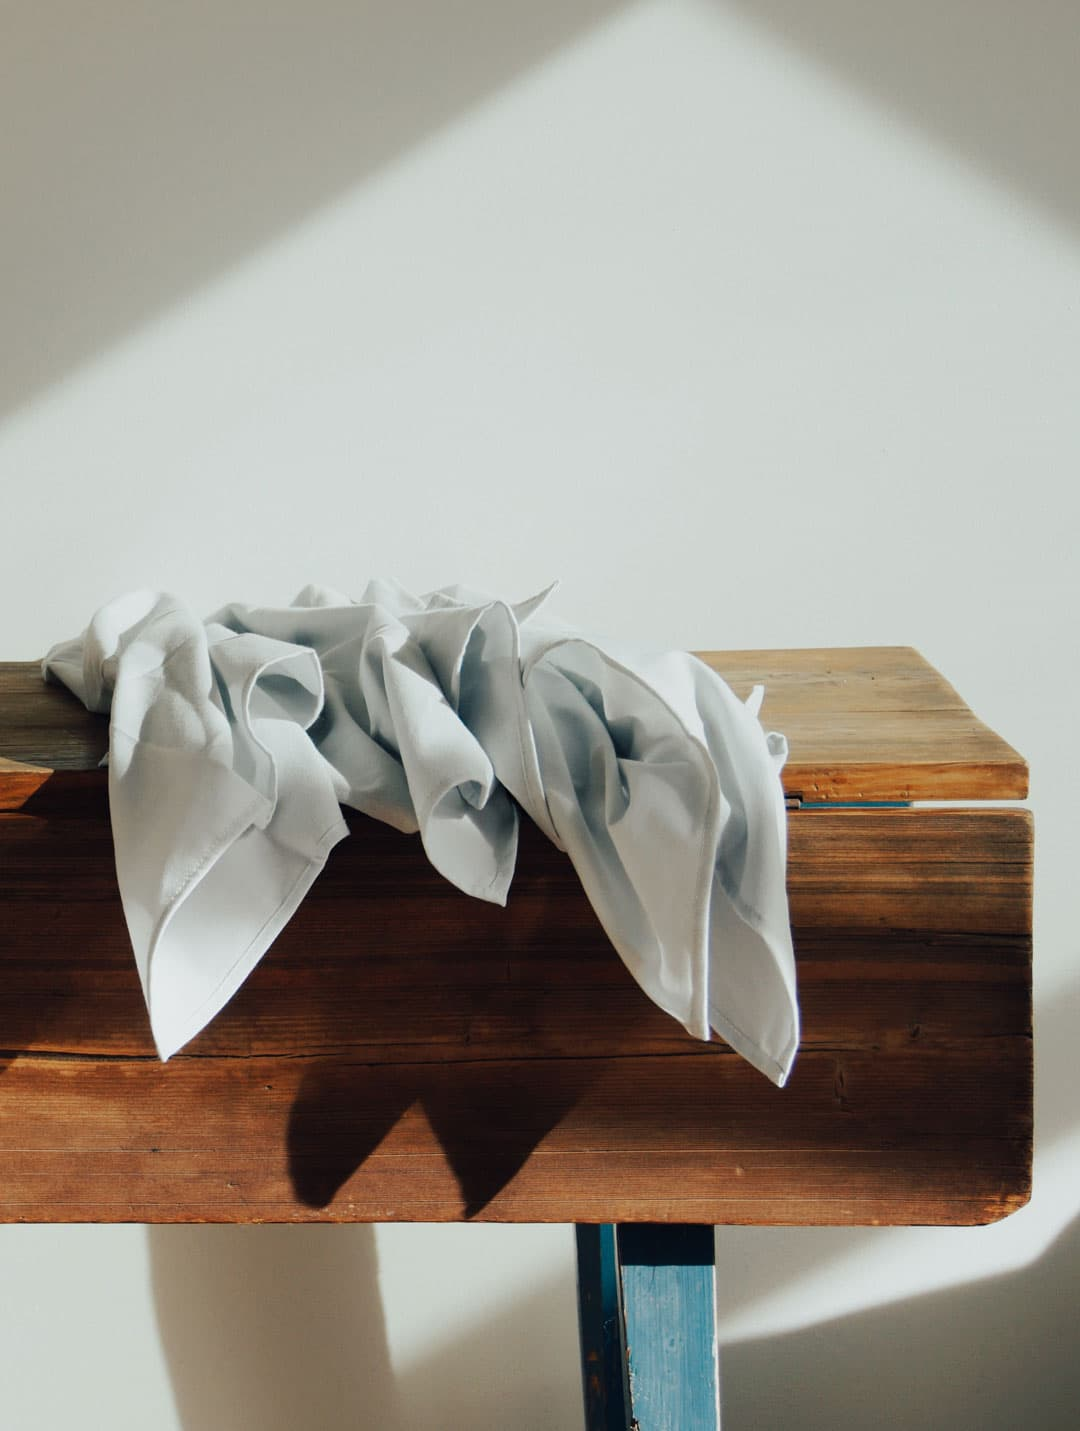 Servilletas tela algodón orgánico Hazia